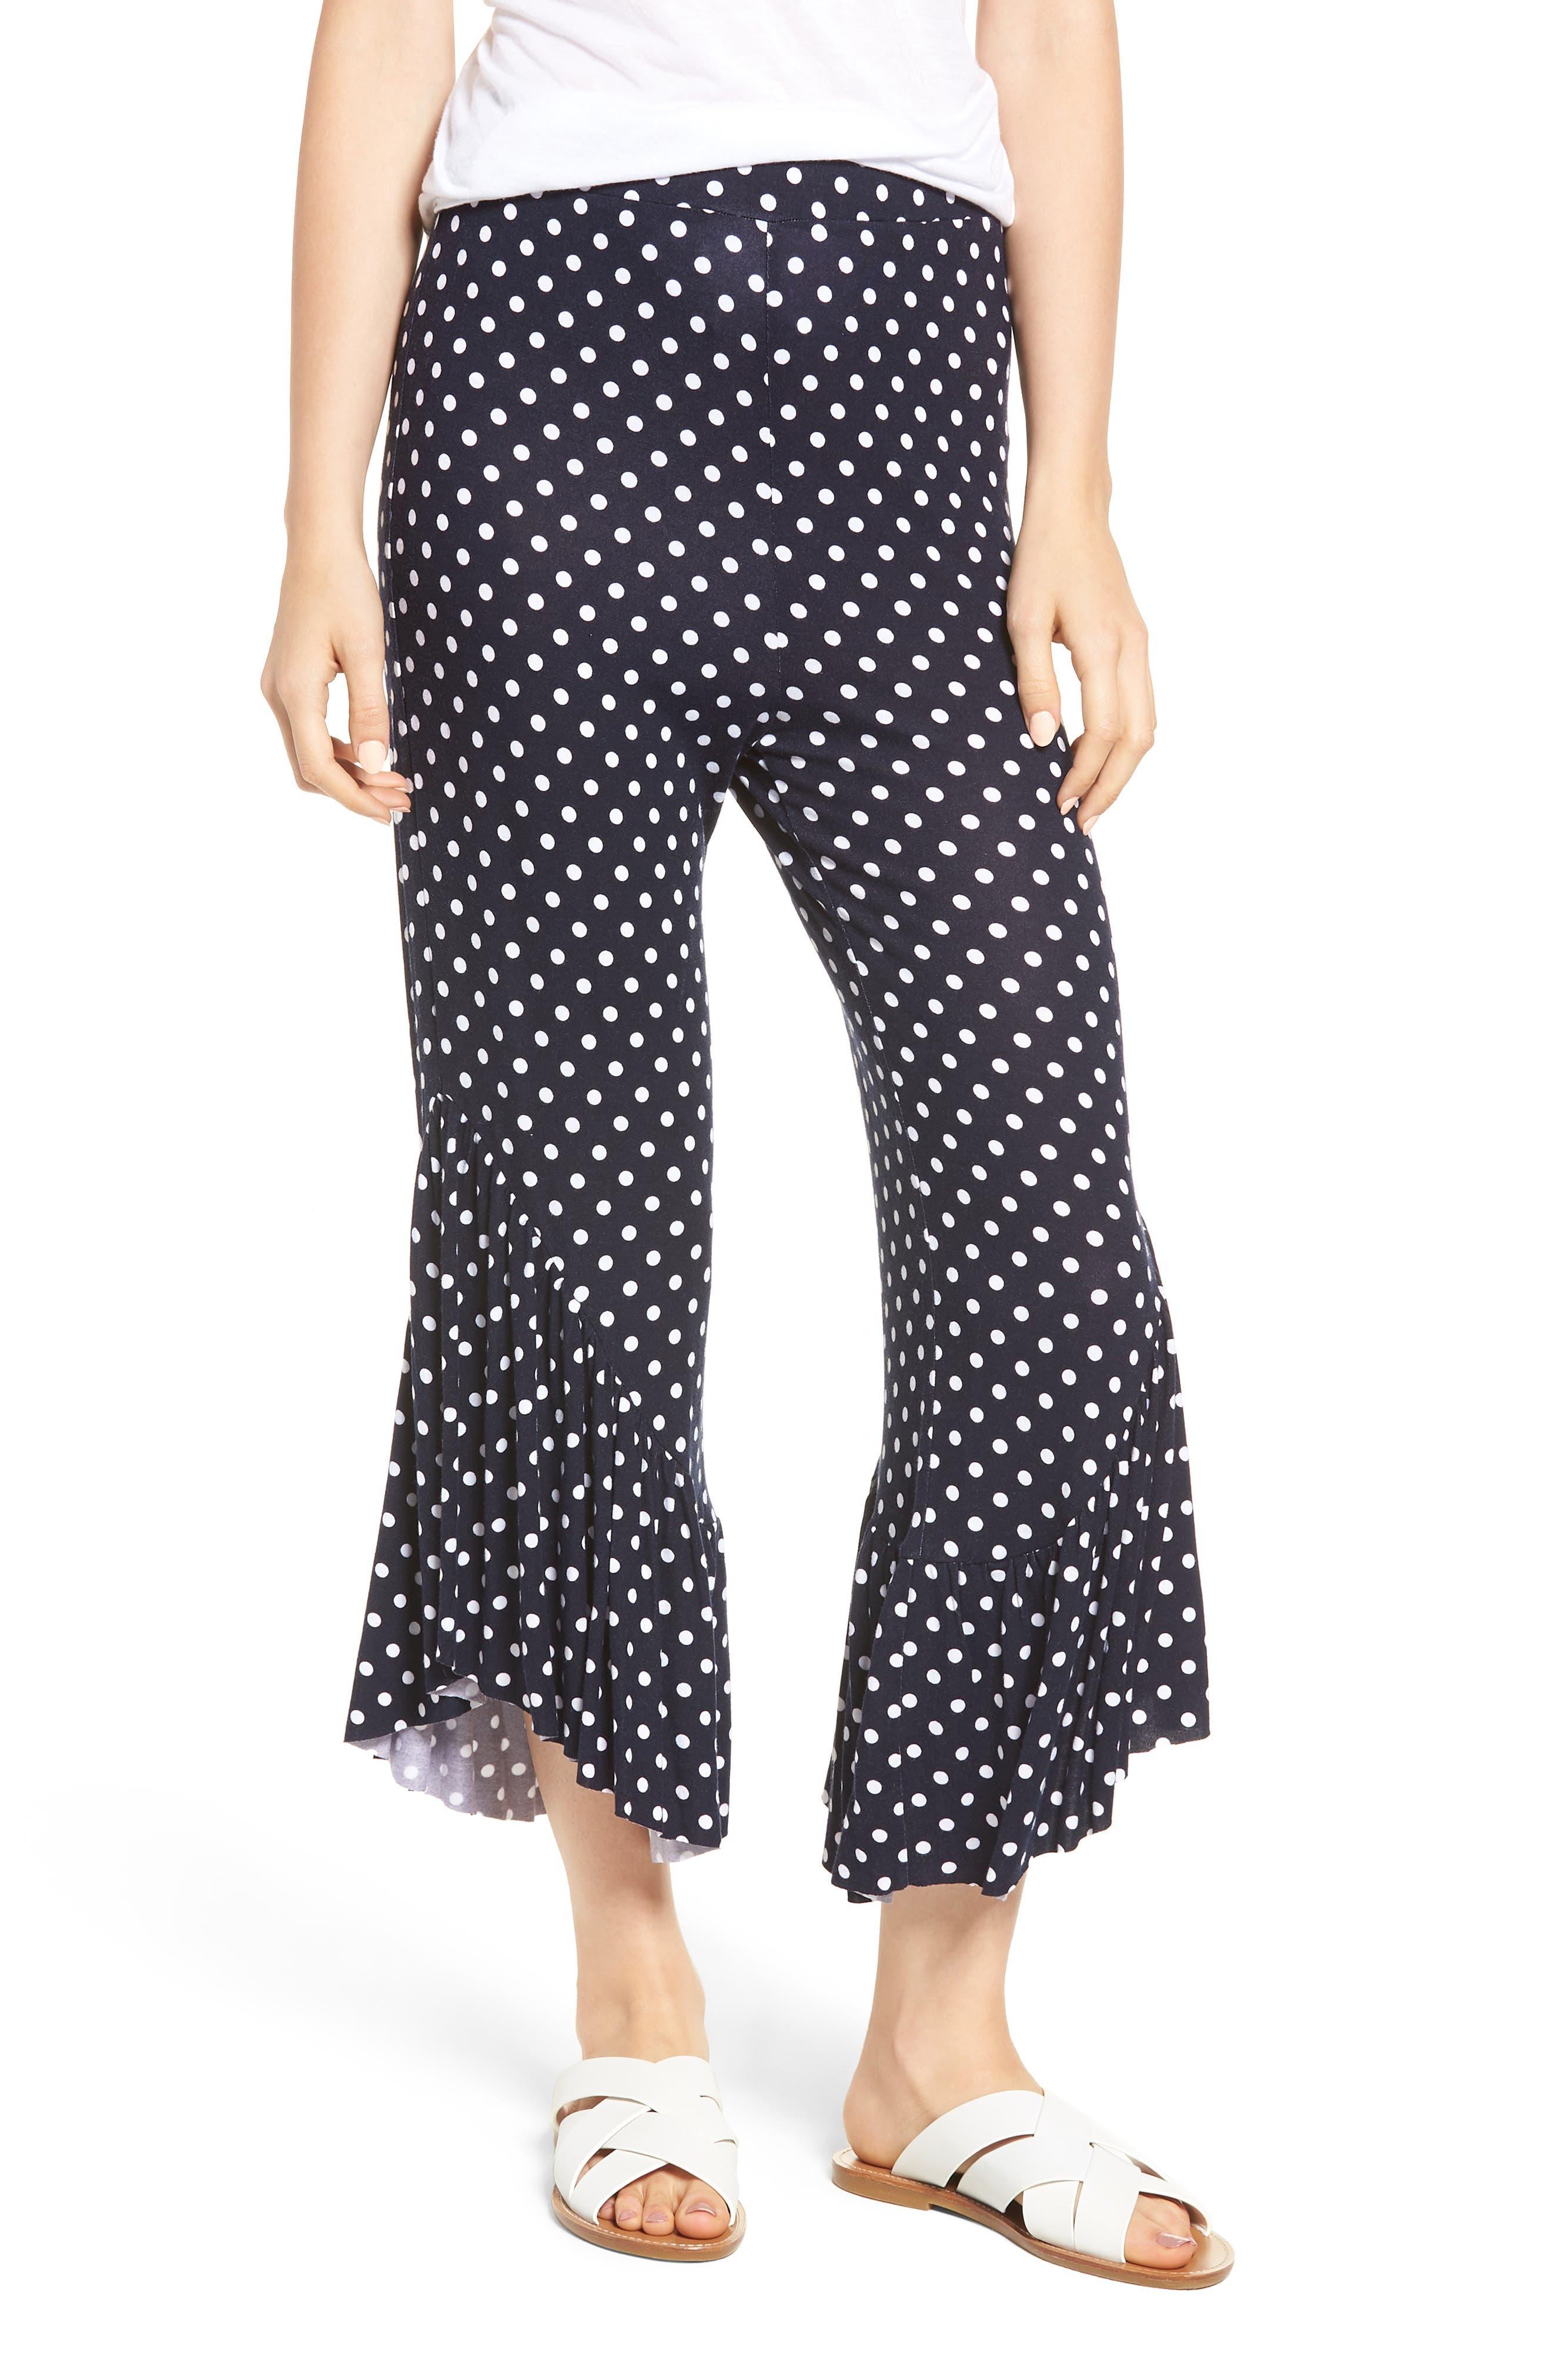 Ruffle Hem Wide Leg Crop Pants,                             Main thumbnail 1, color,                             Navy/ White Polka Dot